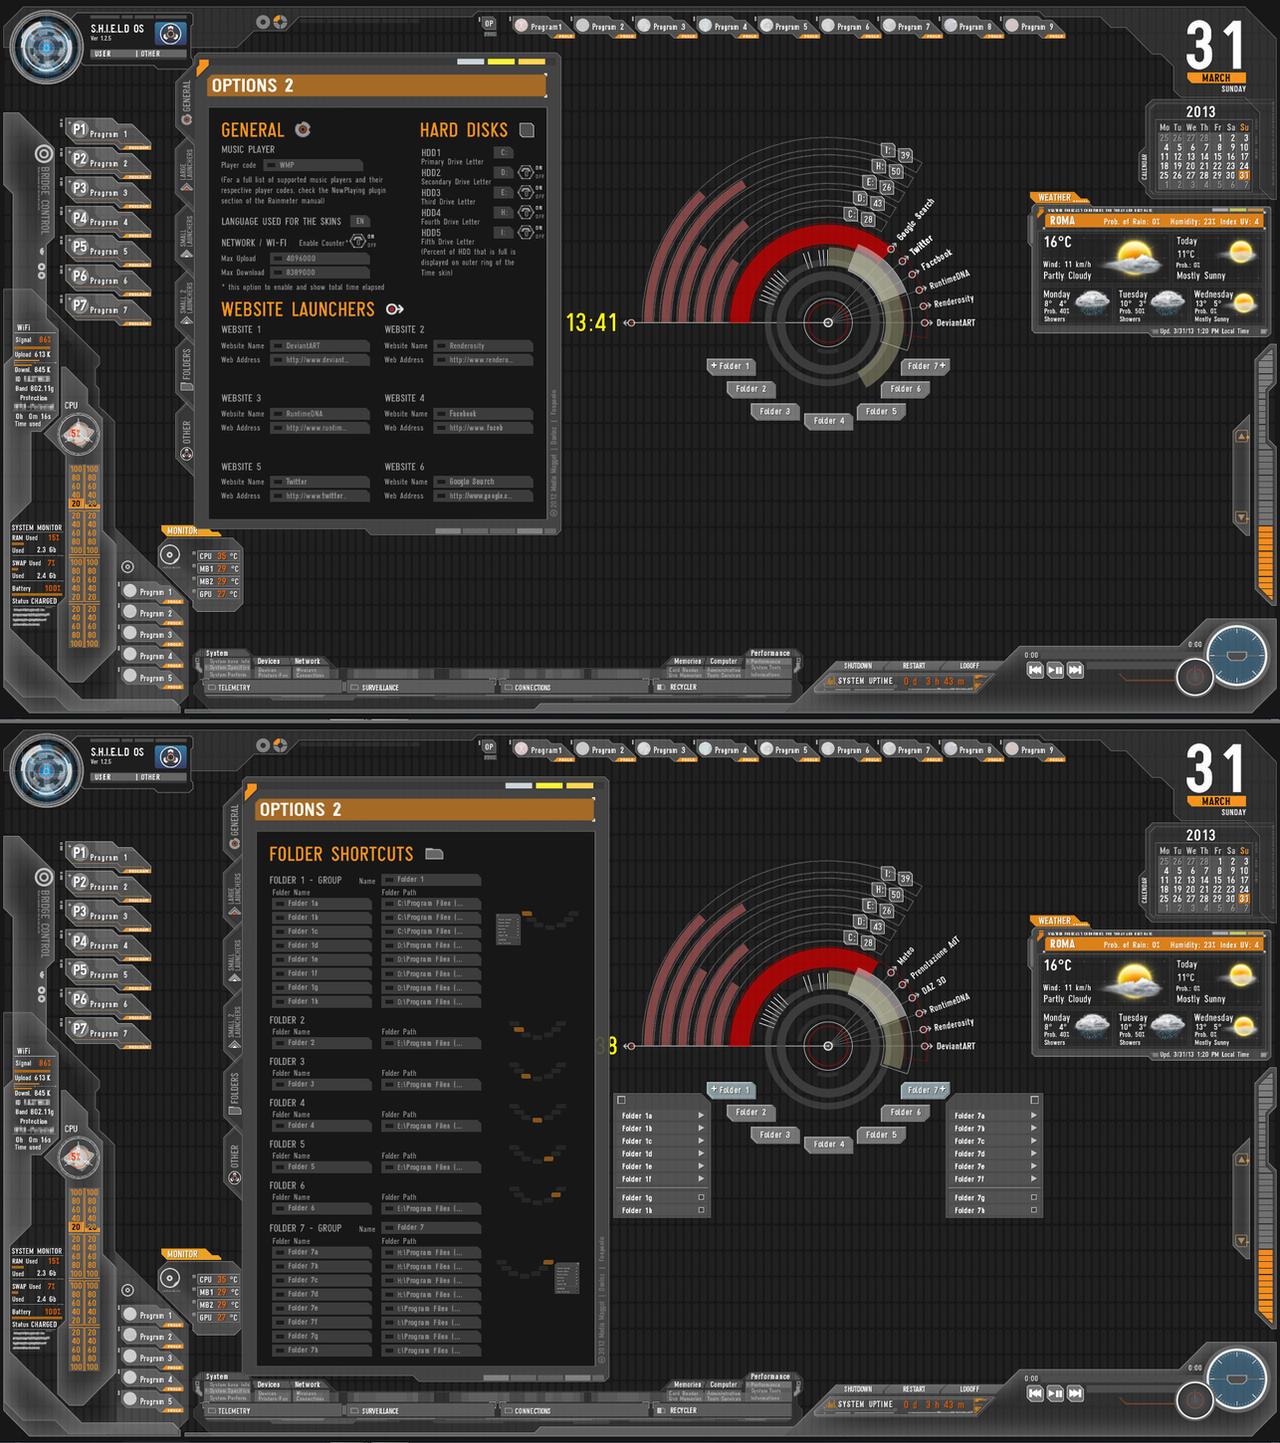 My S.H.I.E.L.D. Desktop Final (I hope...) by Fonpaolo